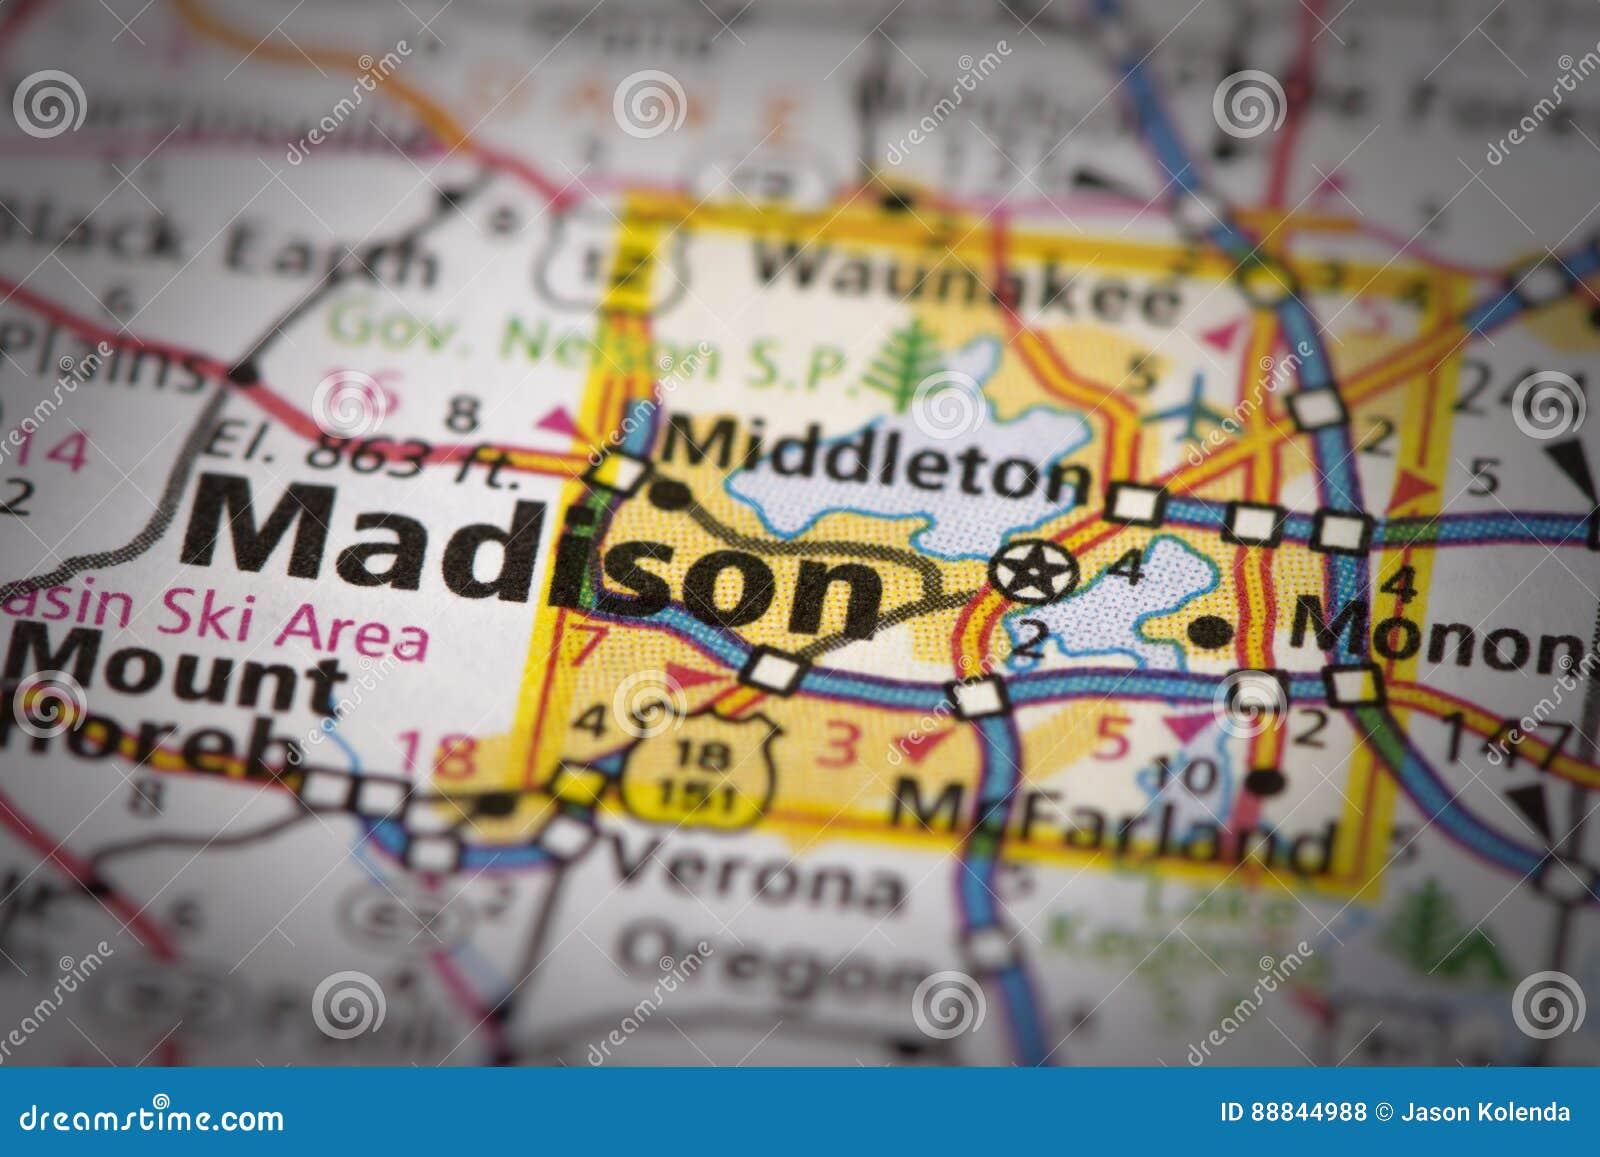 Madison, Wisconsin on map